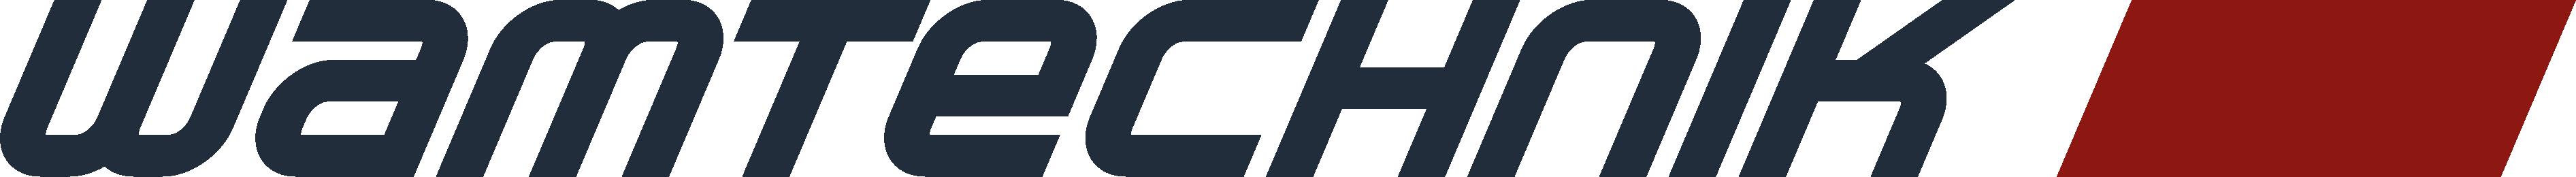 WAMTECHNIK logo